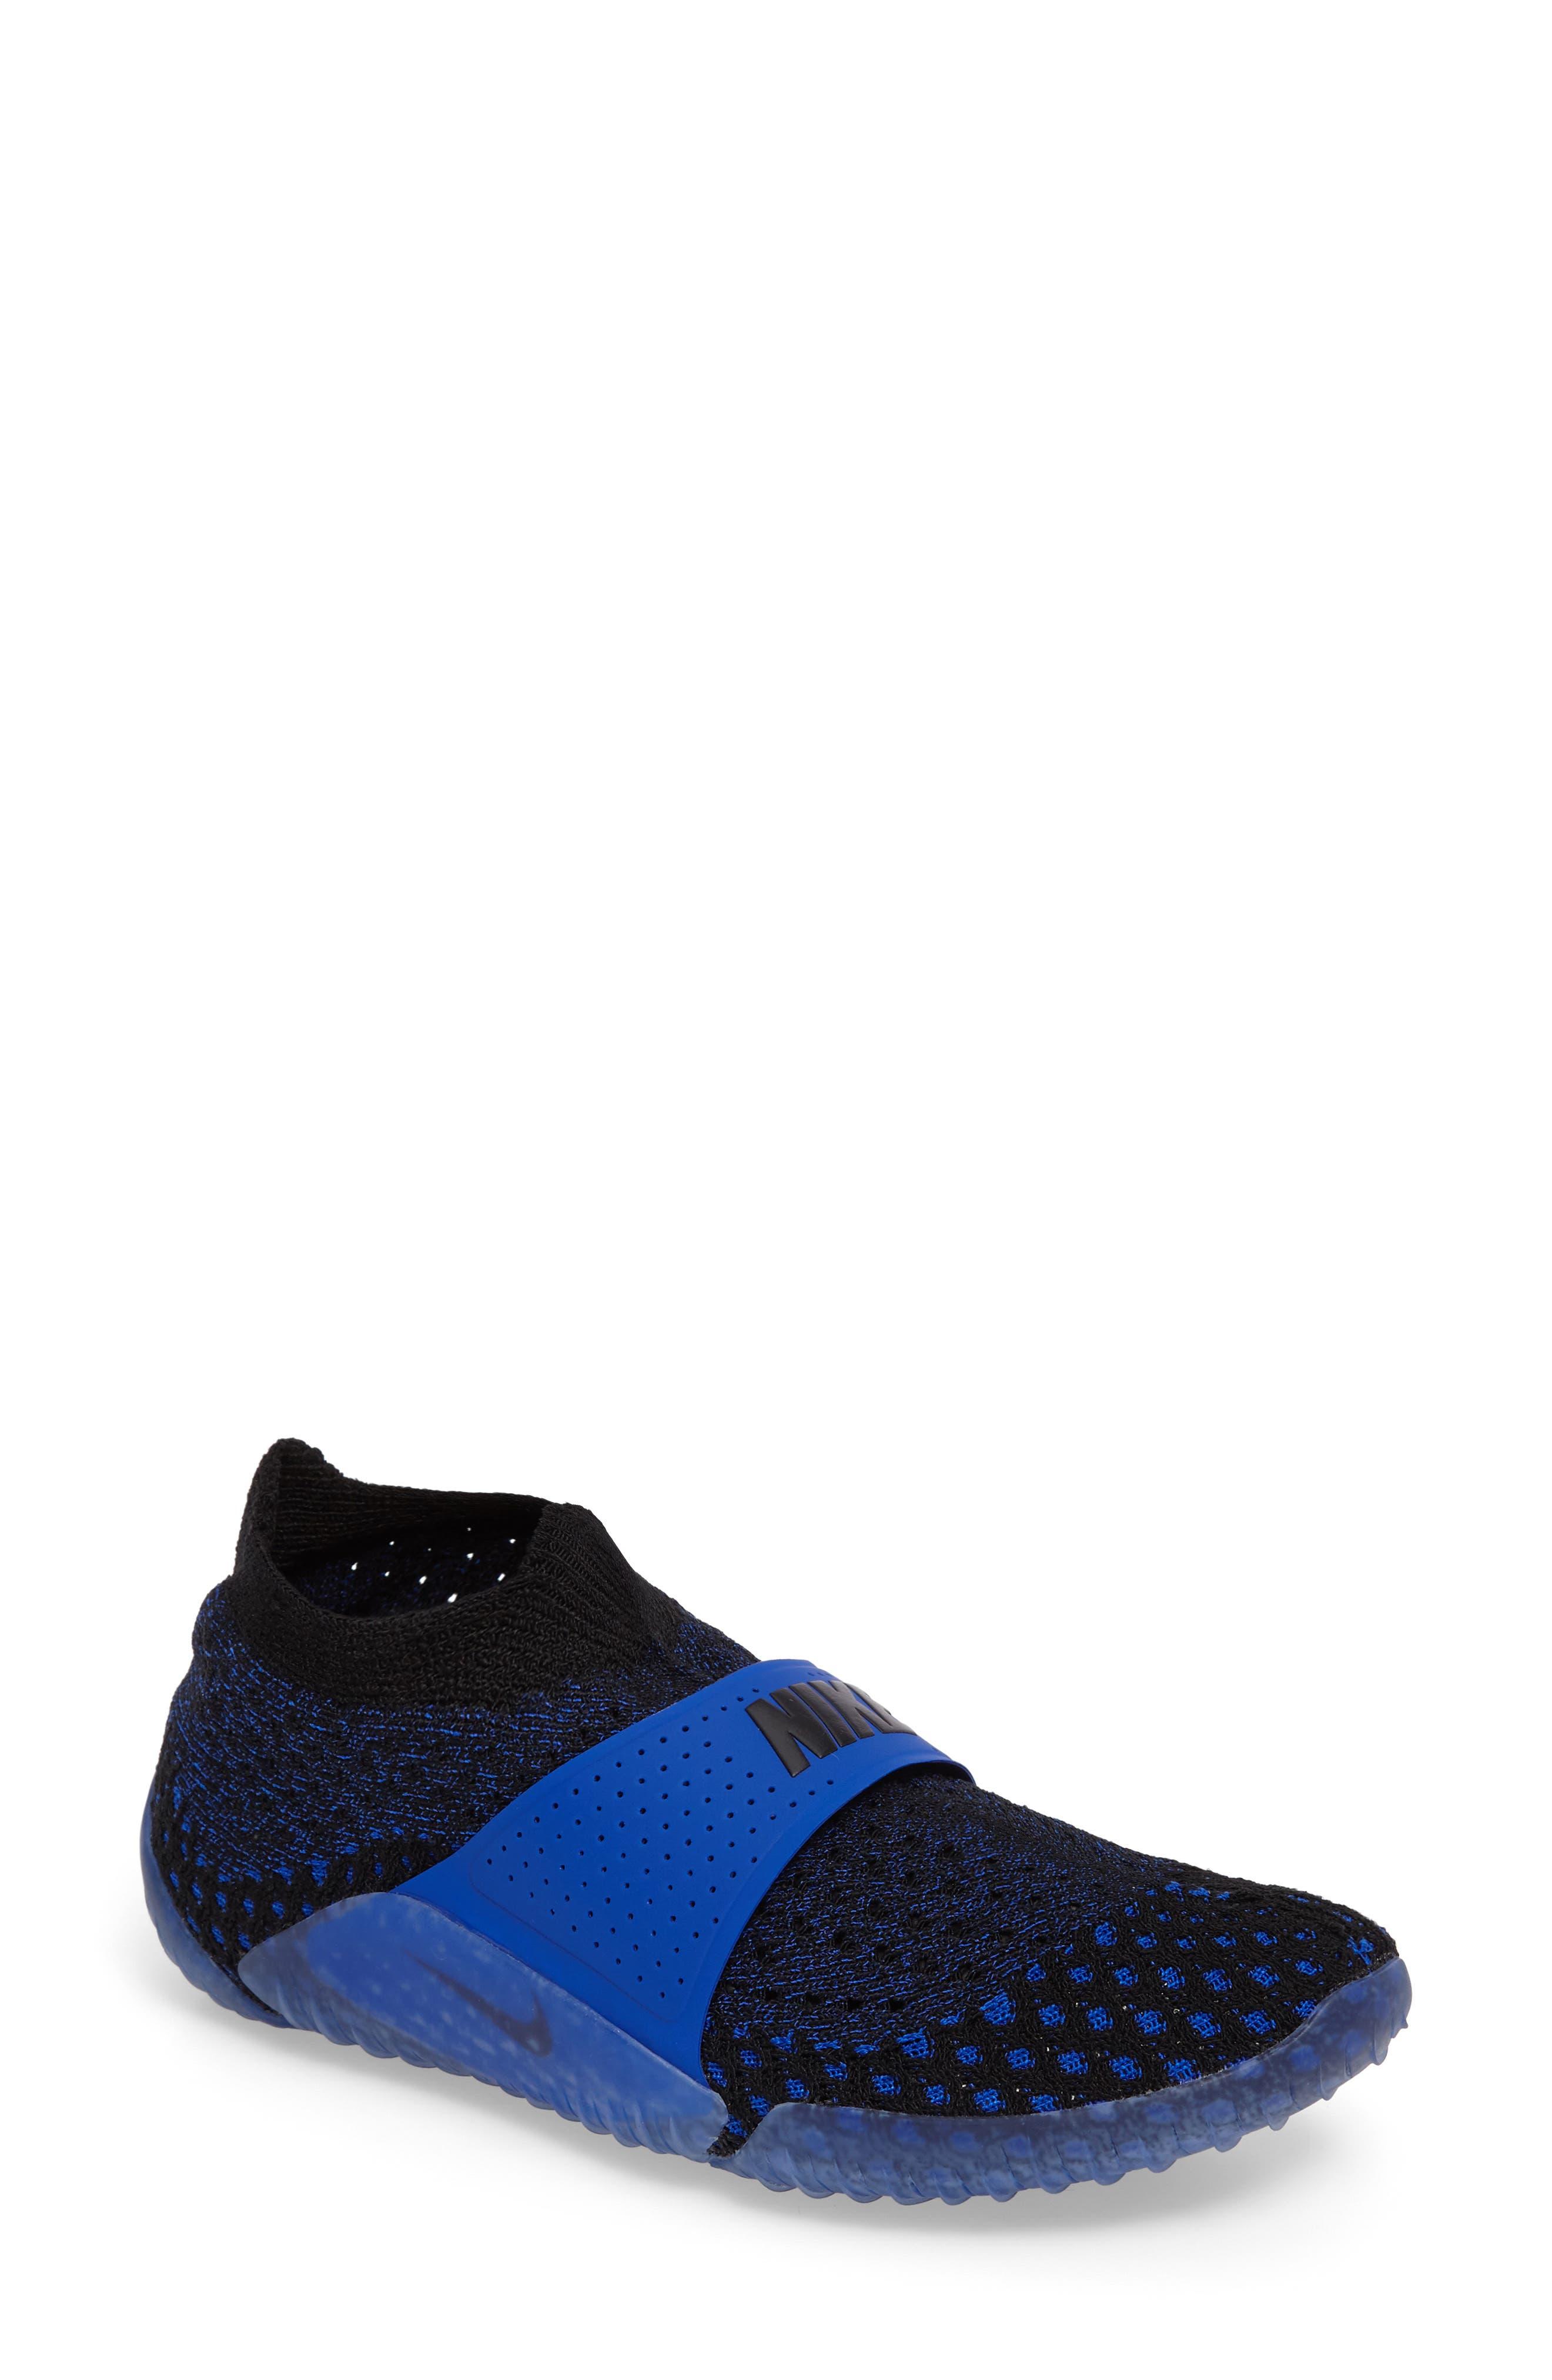 City Knife 3 Flyknit Sneaker,                         Main,                         color, Racer Blue/ Black/ Black